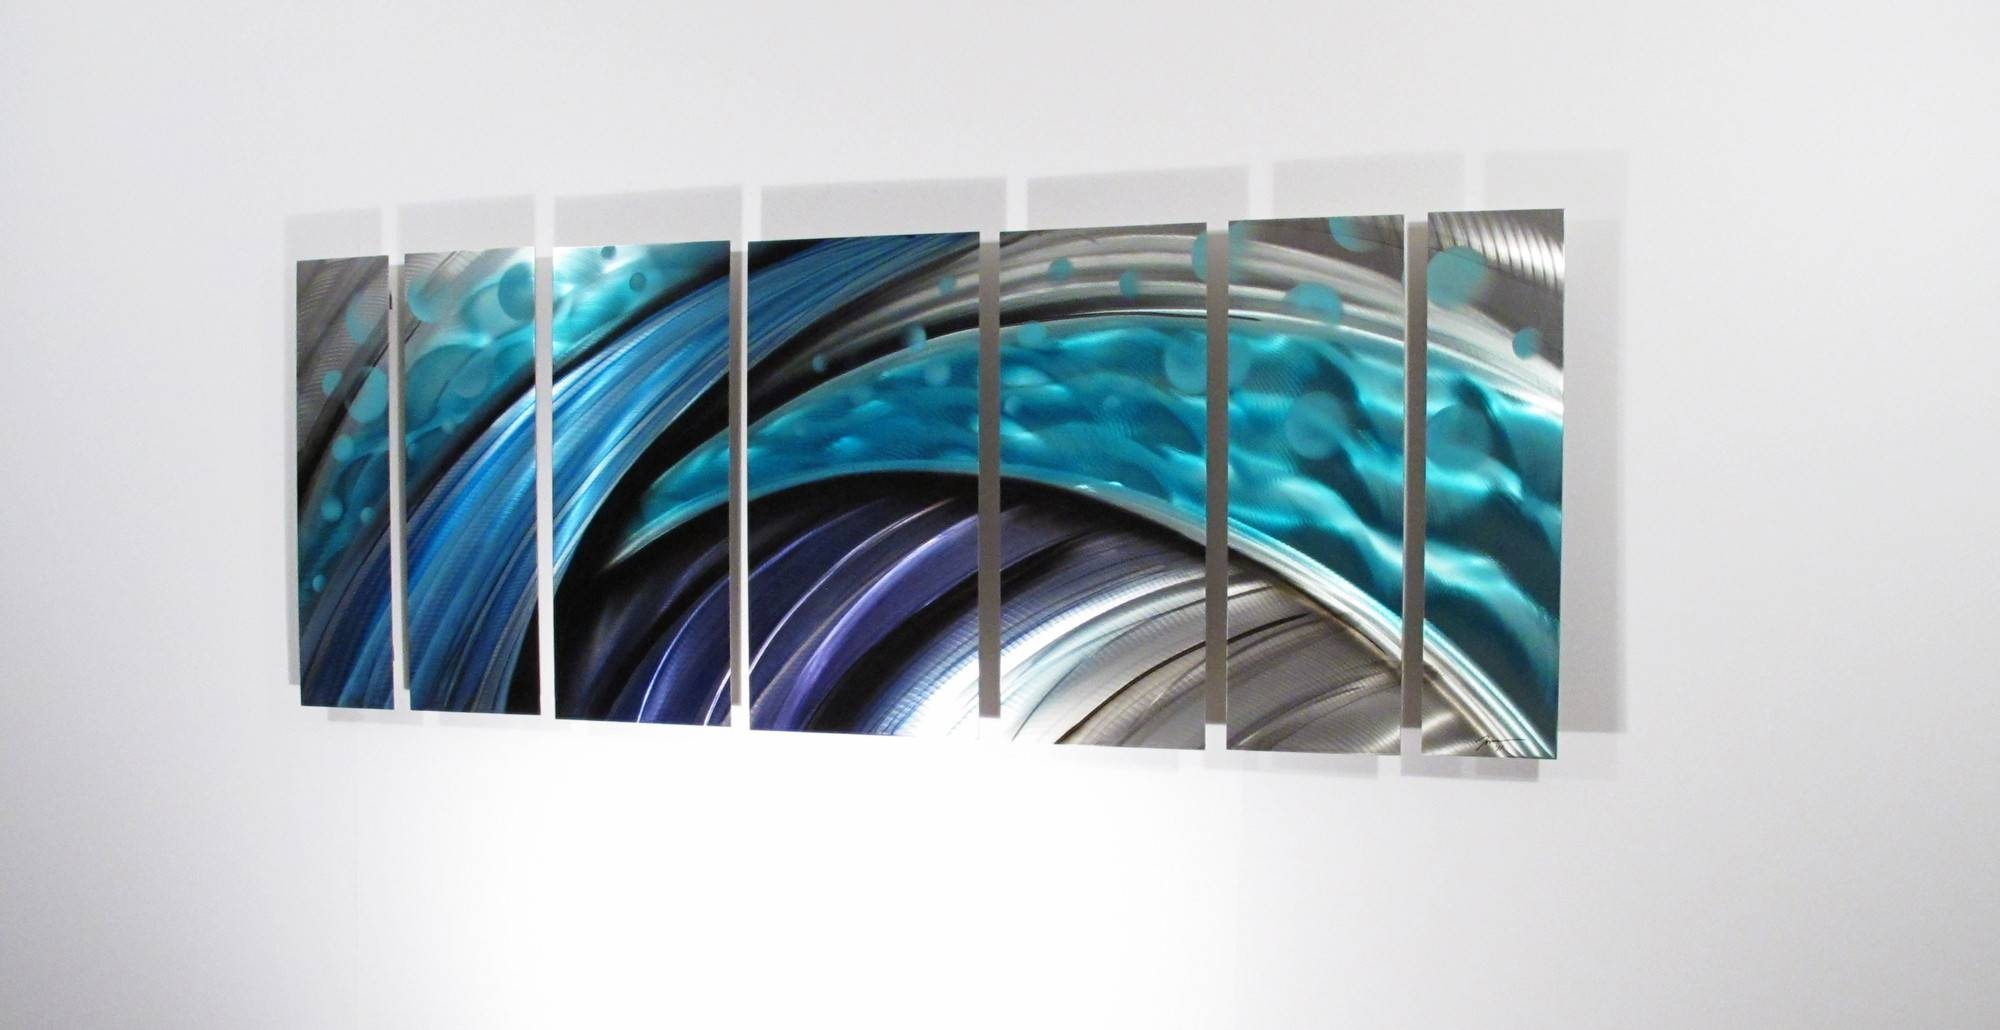 Wall Art Designs: Abstract Metal Wall Art Modern Abstract Metal Inside Most Popular Metal Abstract Wall Art (View 3 of 15)